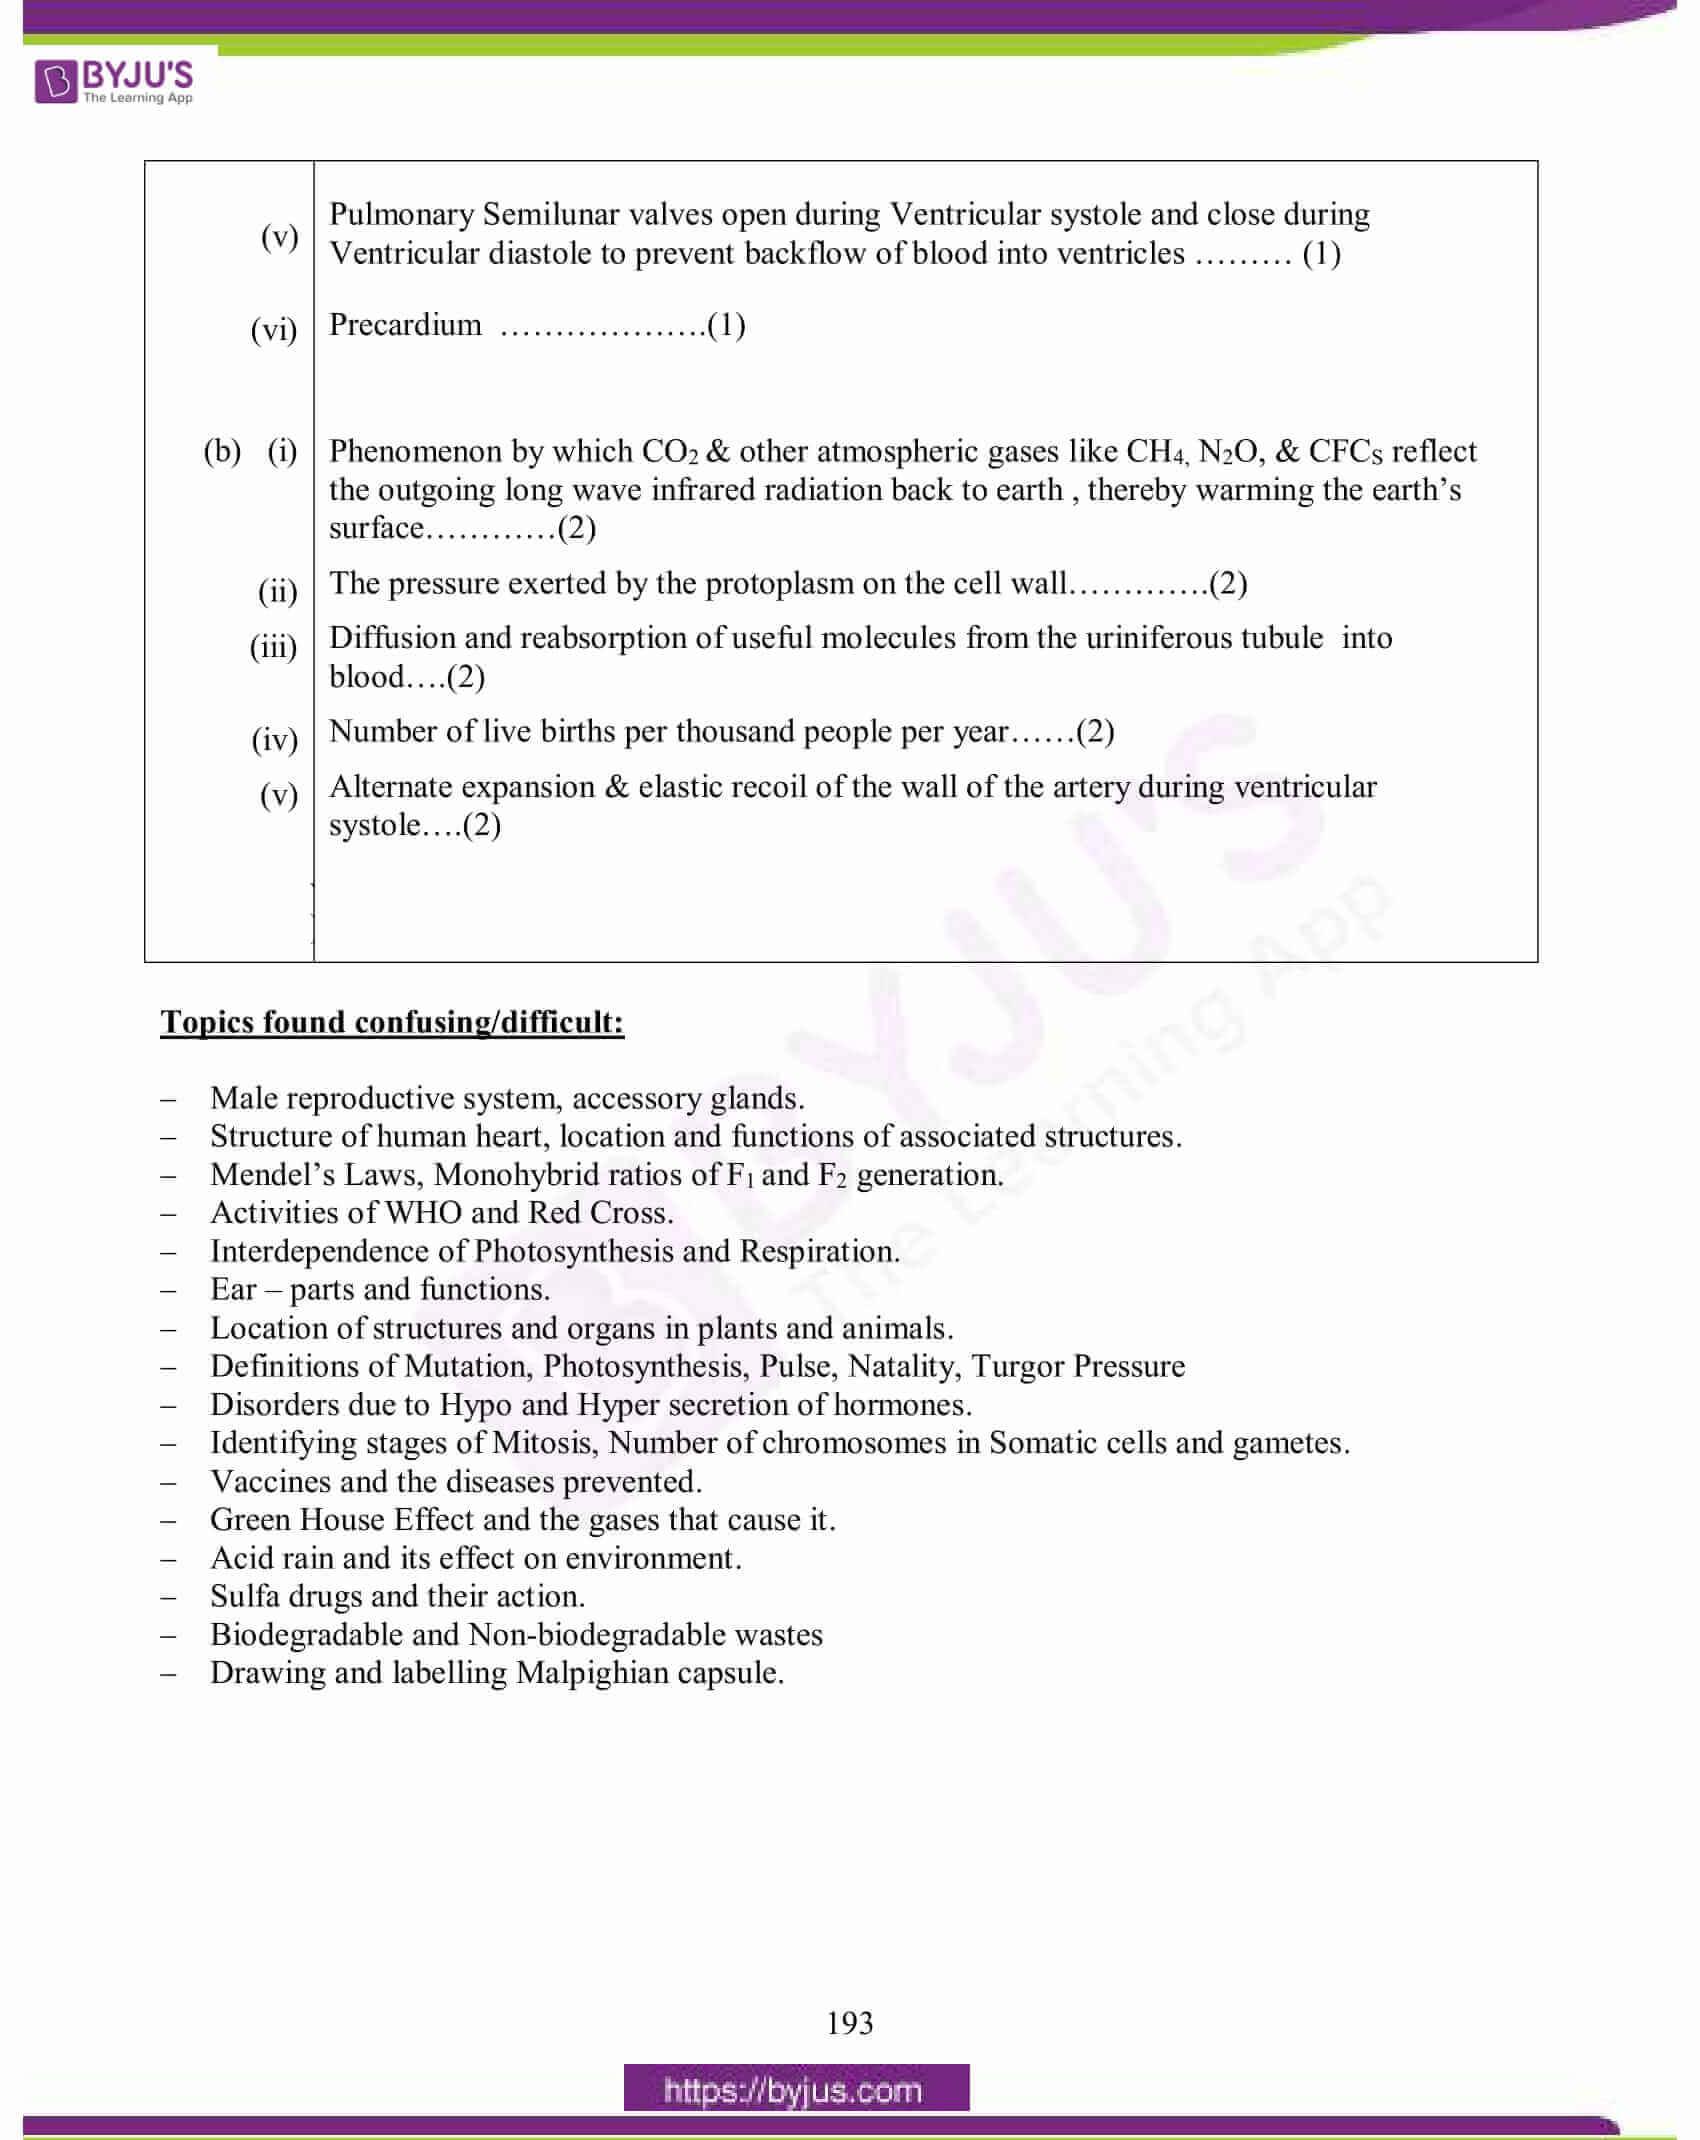 icse class 10 biology question paper solution 2015 20